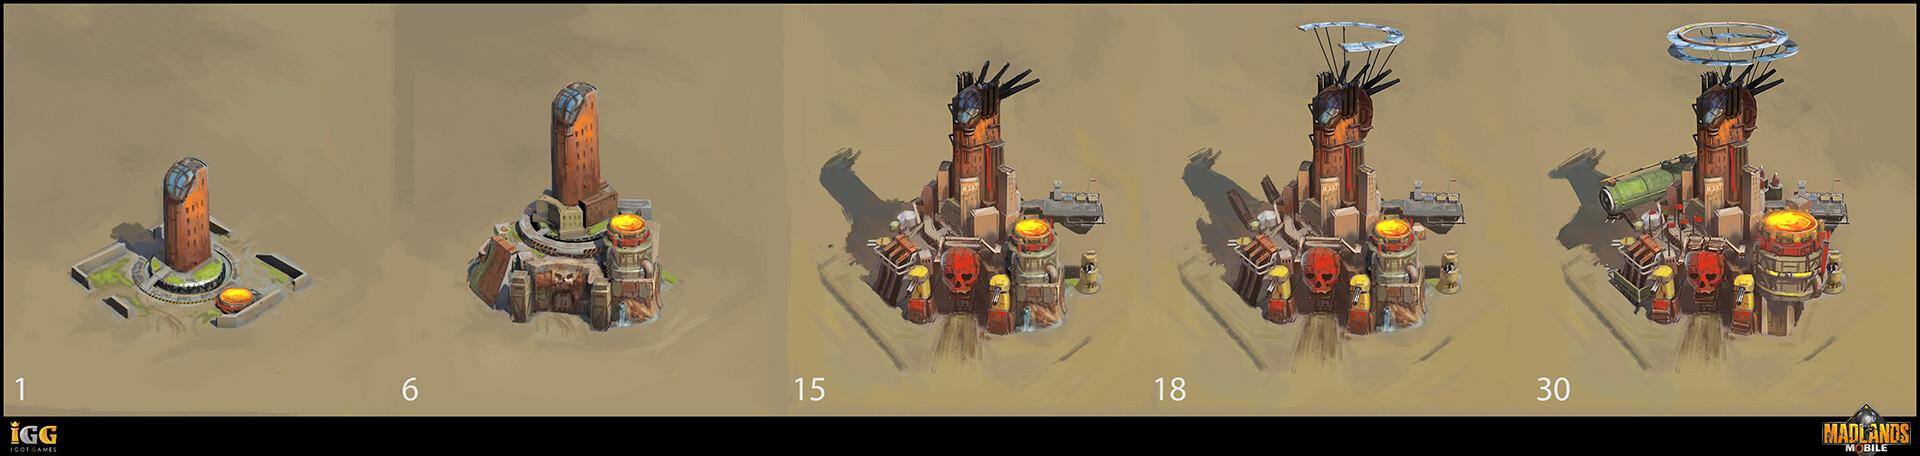 Player headquarters level progression designs.